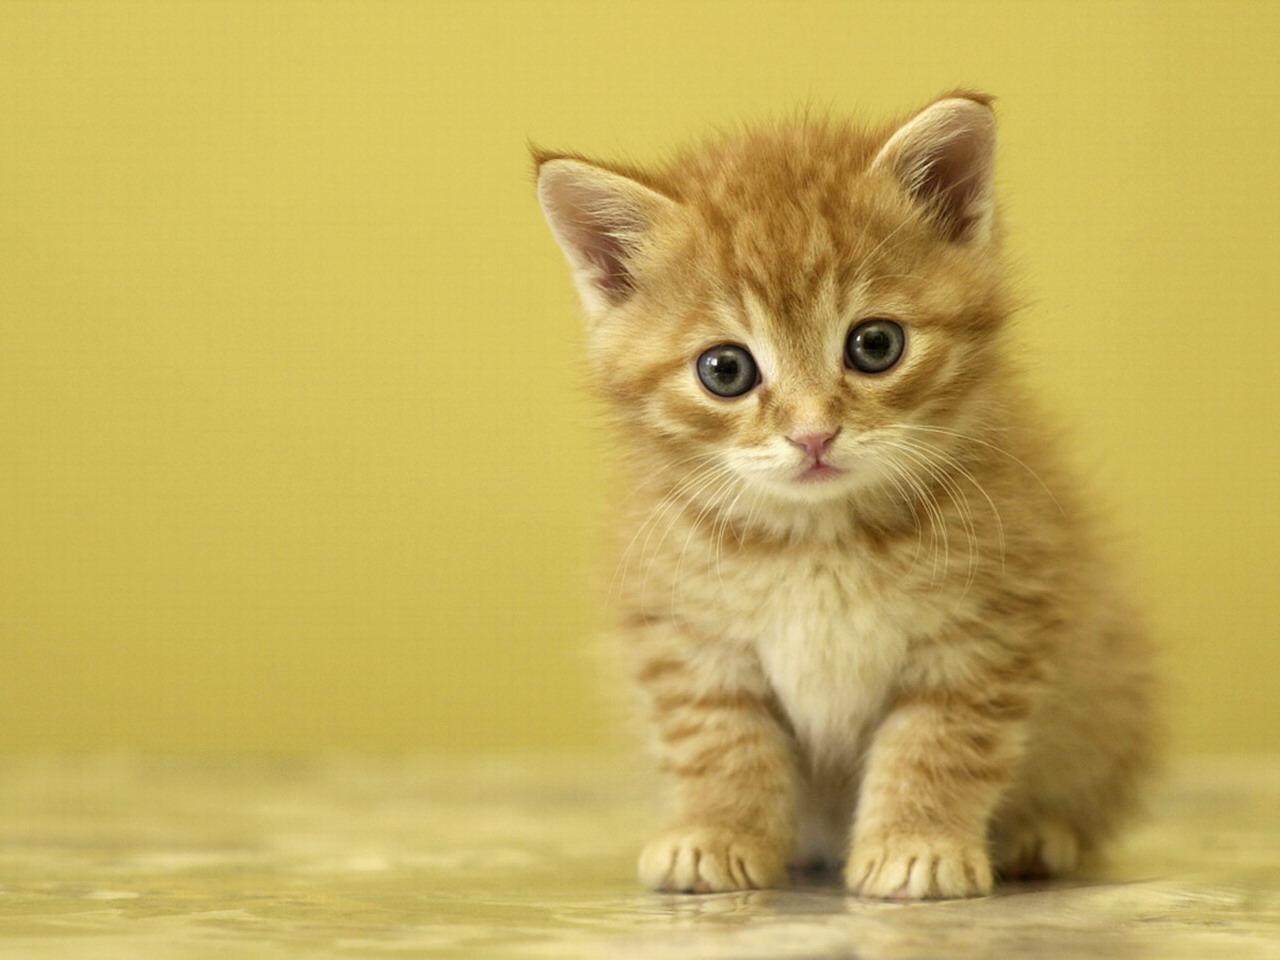 Foto Anak Kucing Lucu Imut